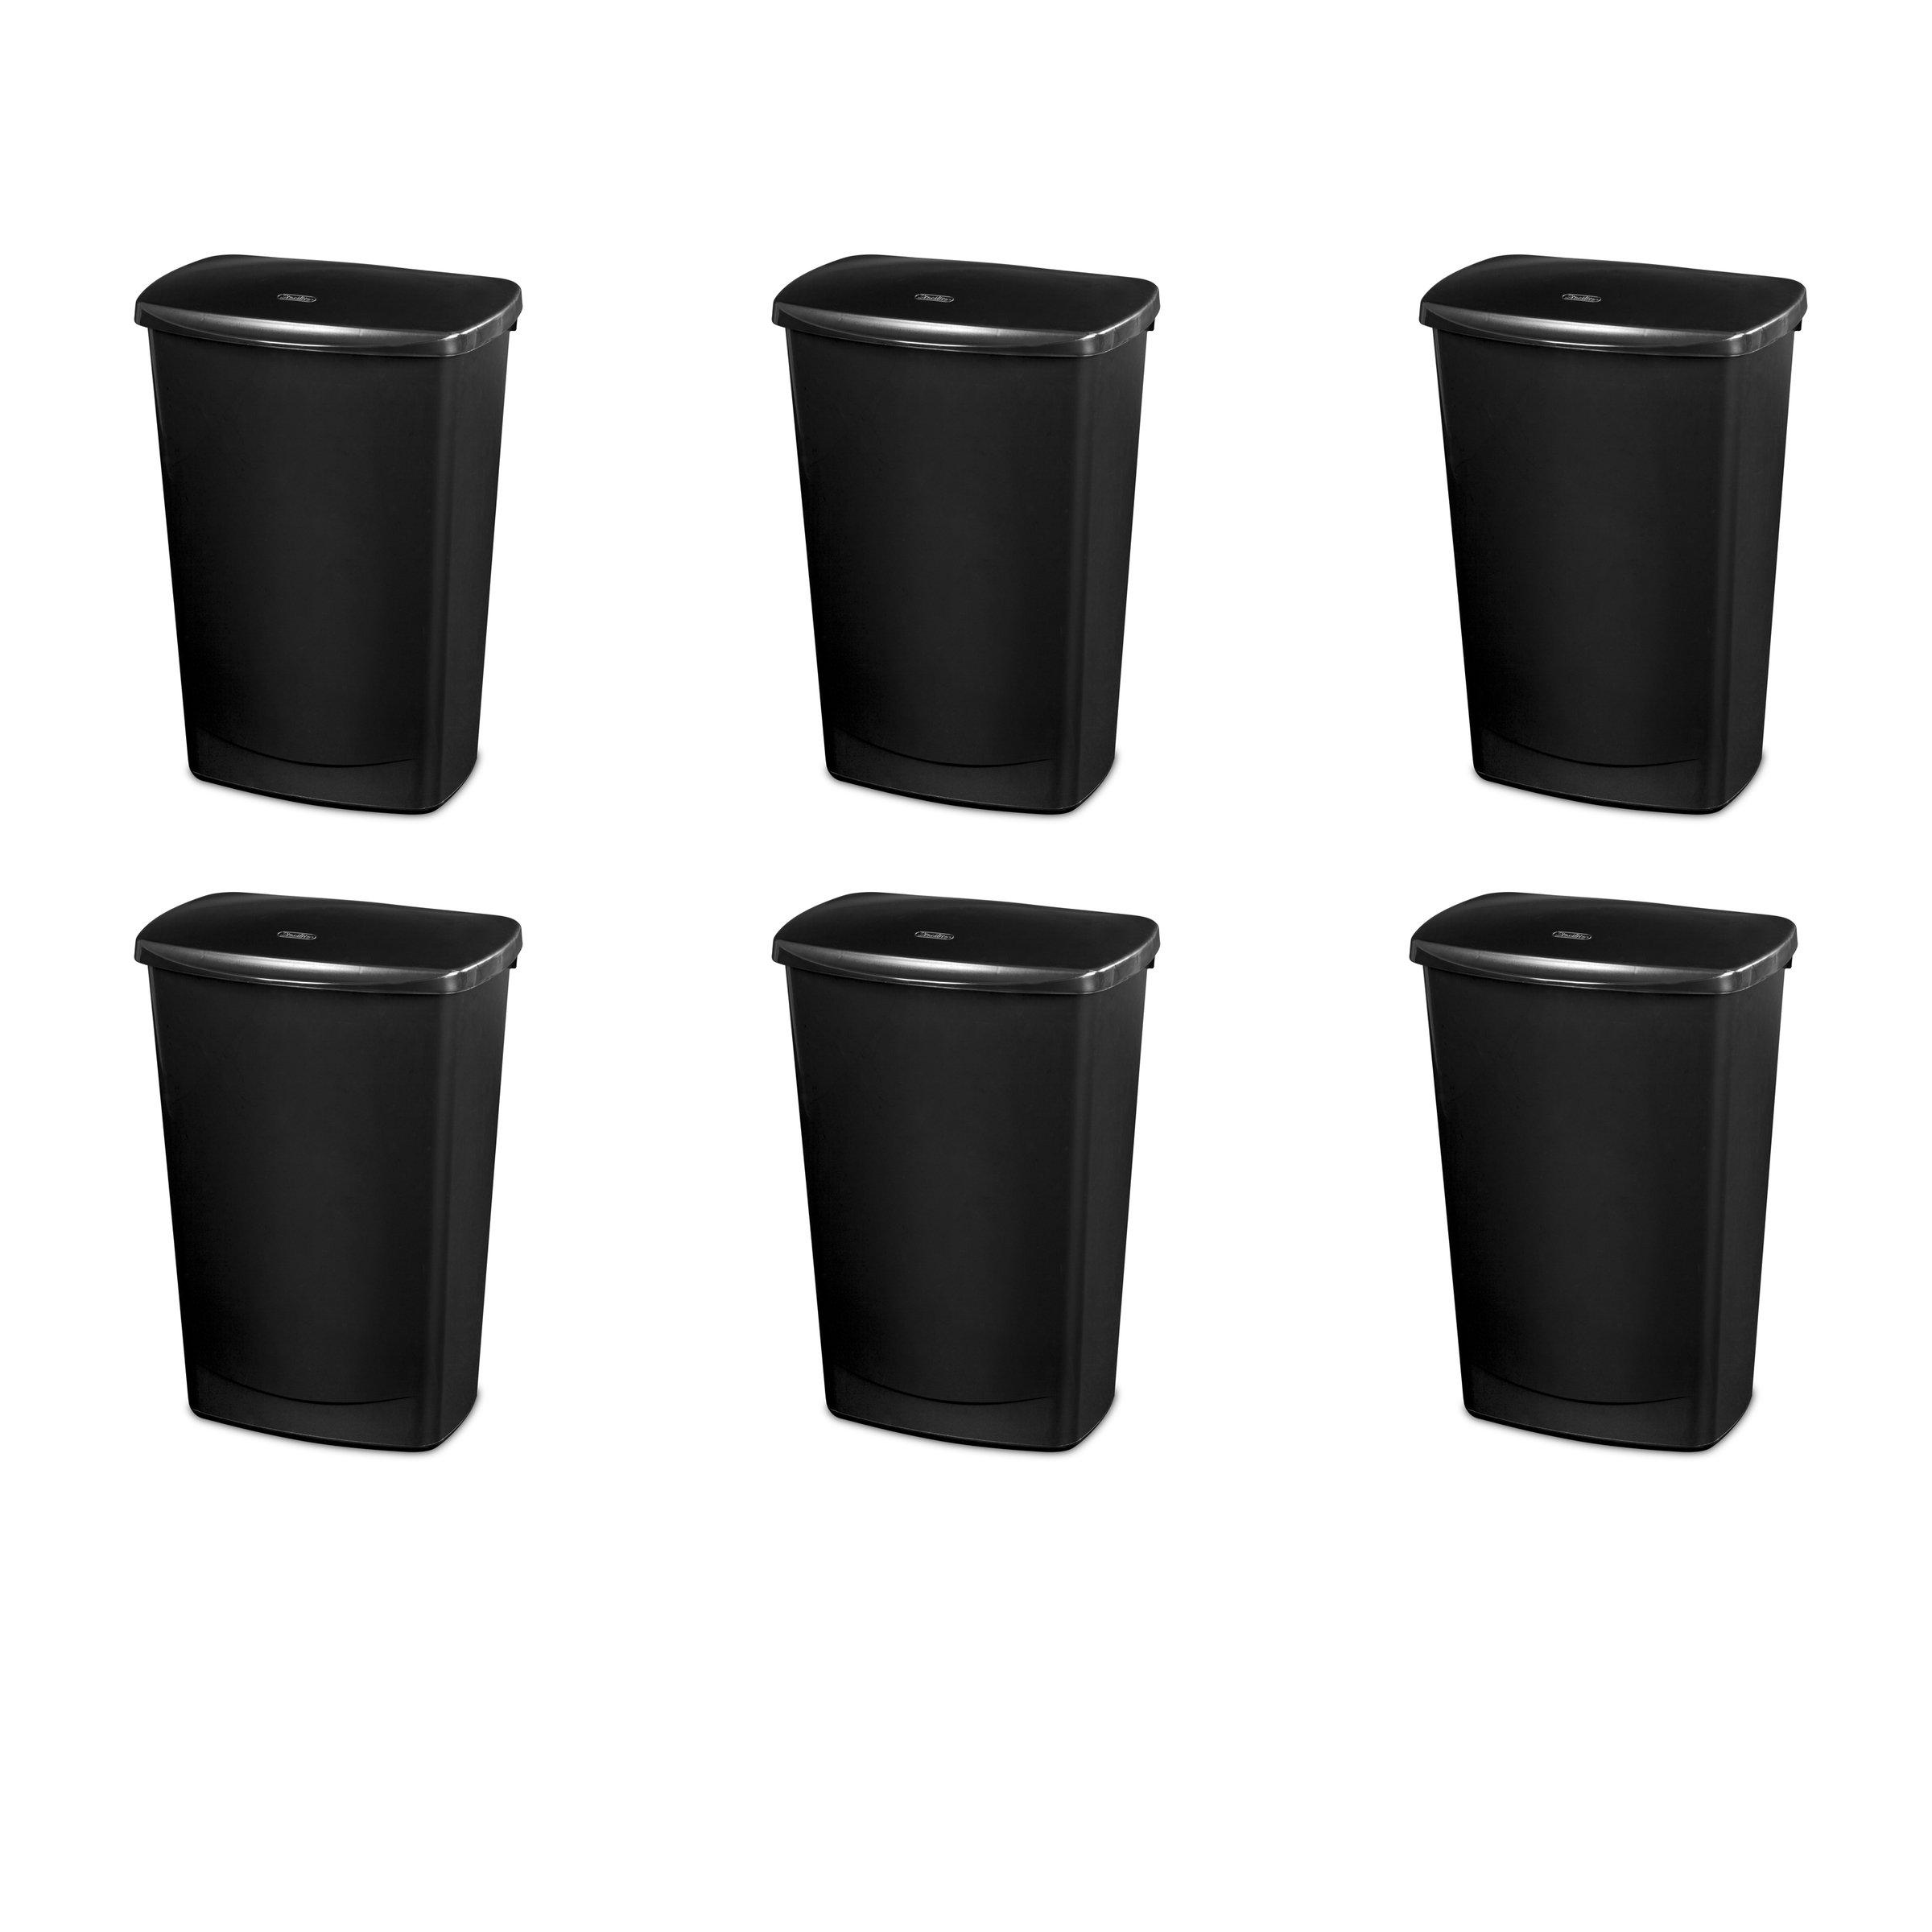 Sterilite 10919006 11.4 Gallon/43 Liter LiftTop Wastebasket, Black Lid & Base, 6-Pack